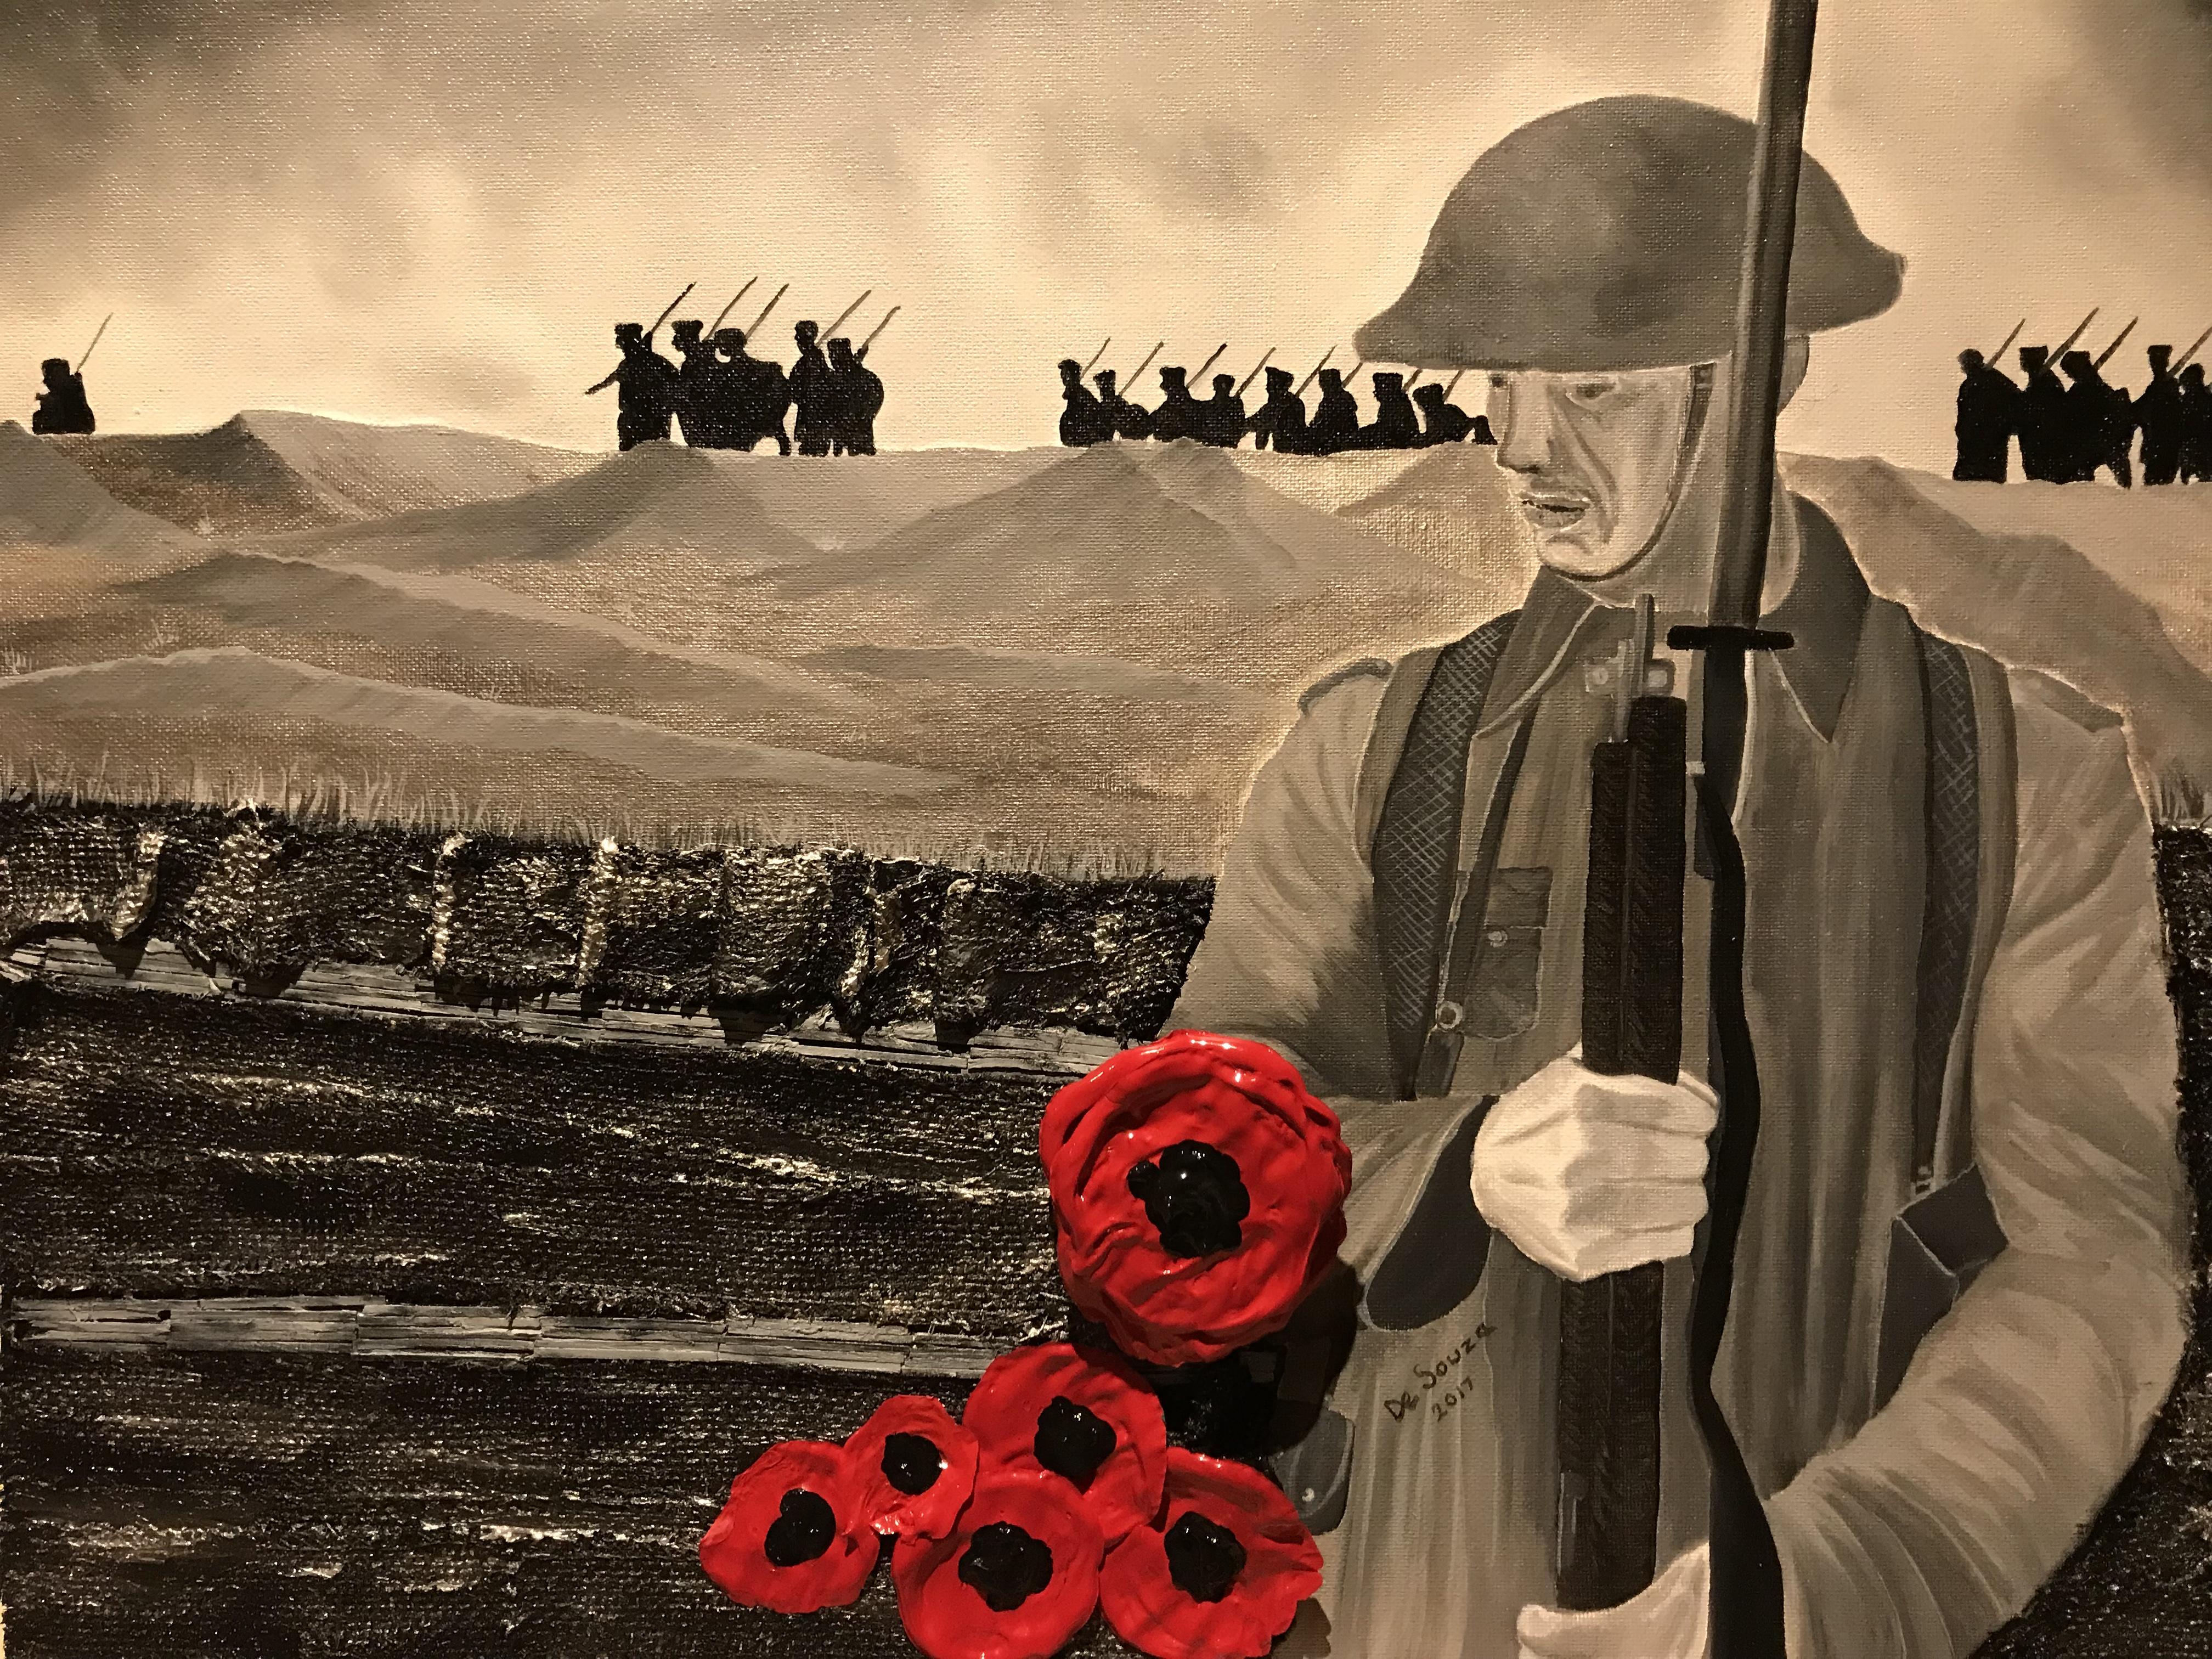 Poppy by Davethepioneer